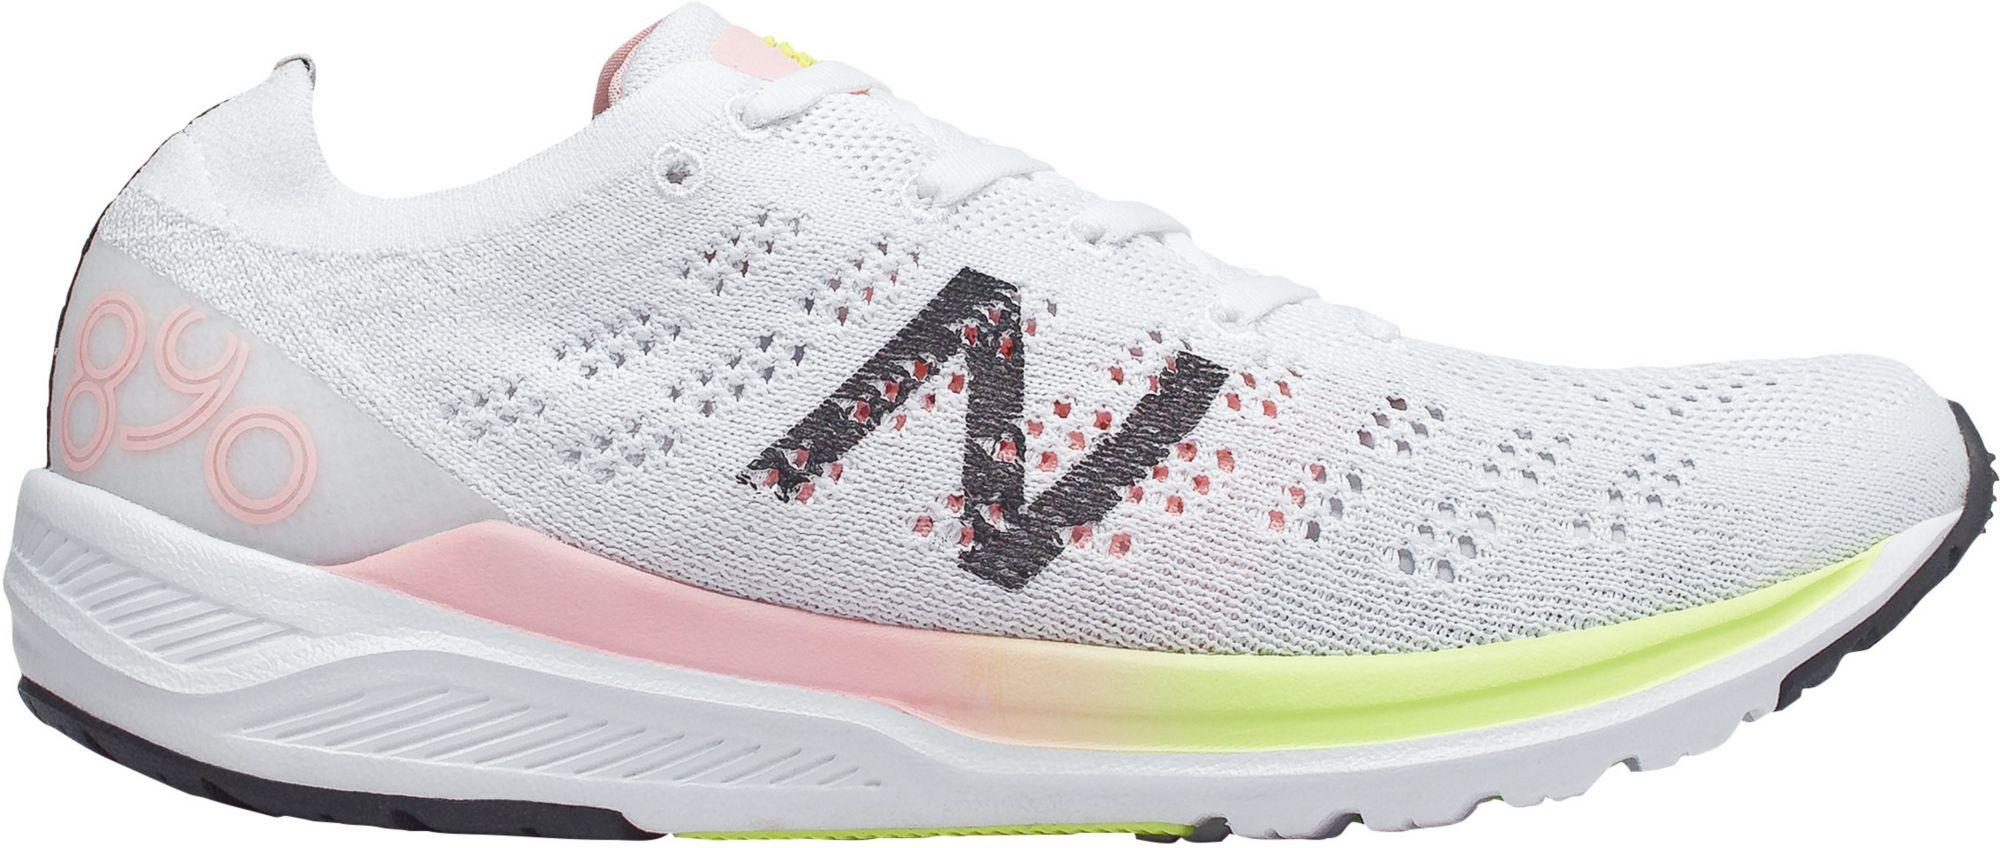 9de79f55d6af7 New Balance Women's 890v7 Running Shoes | DICK'S Sporting ...